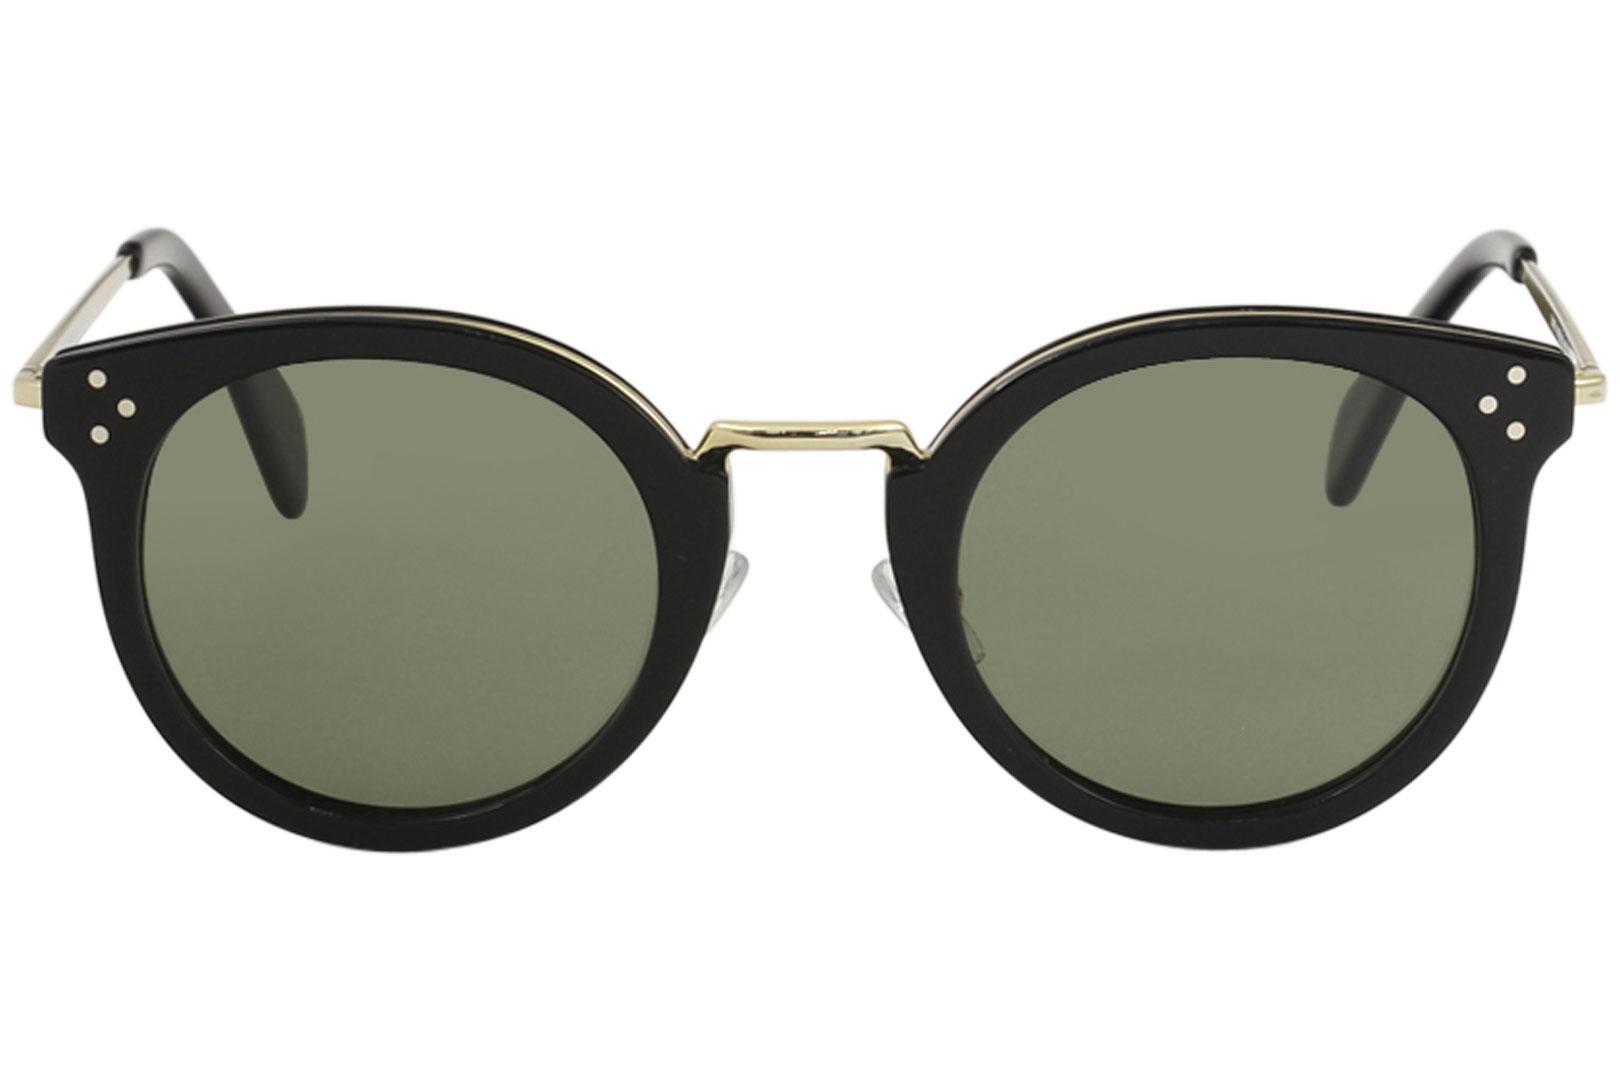 8fdb916a707 Celine Women s CL40011U CL 40011 U Fashion Round Sunglasses by Celine